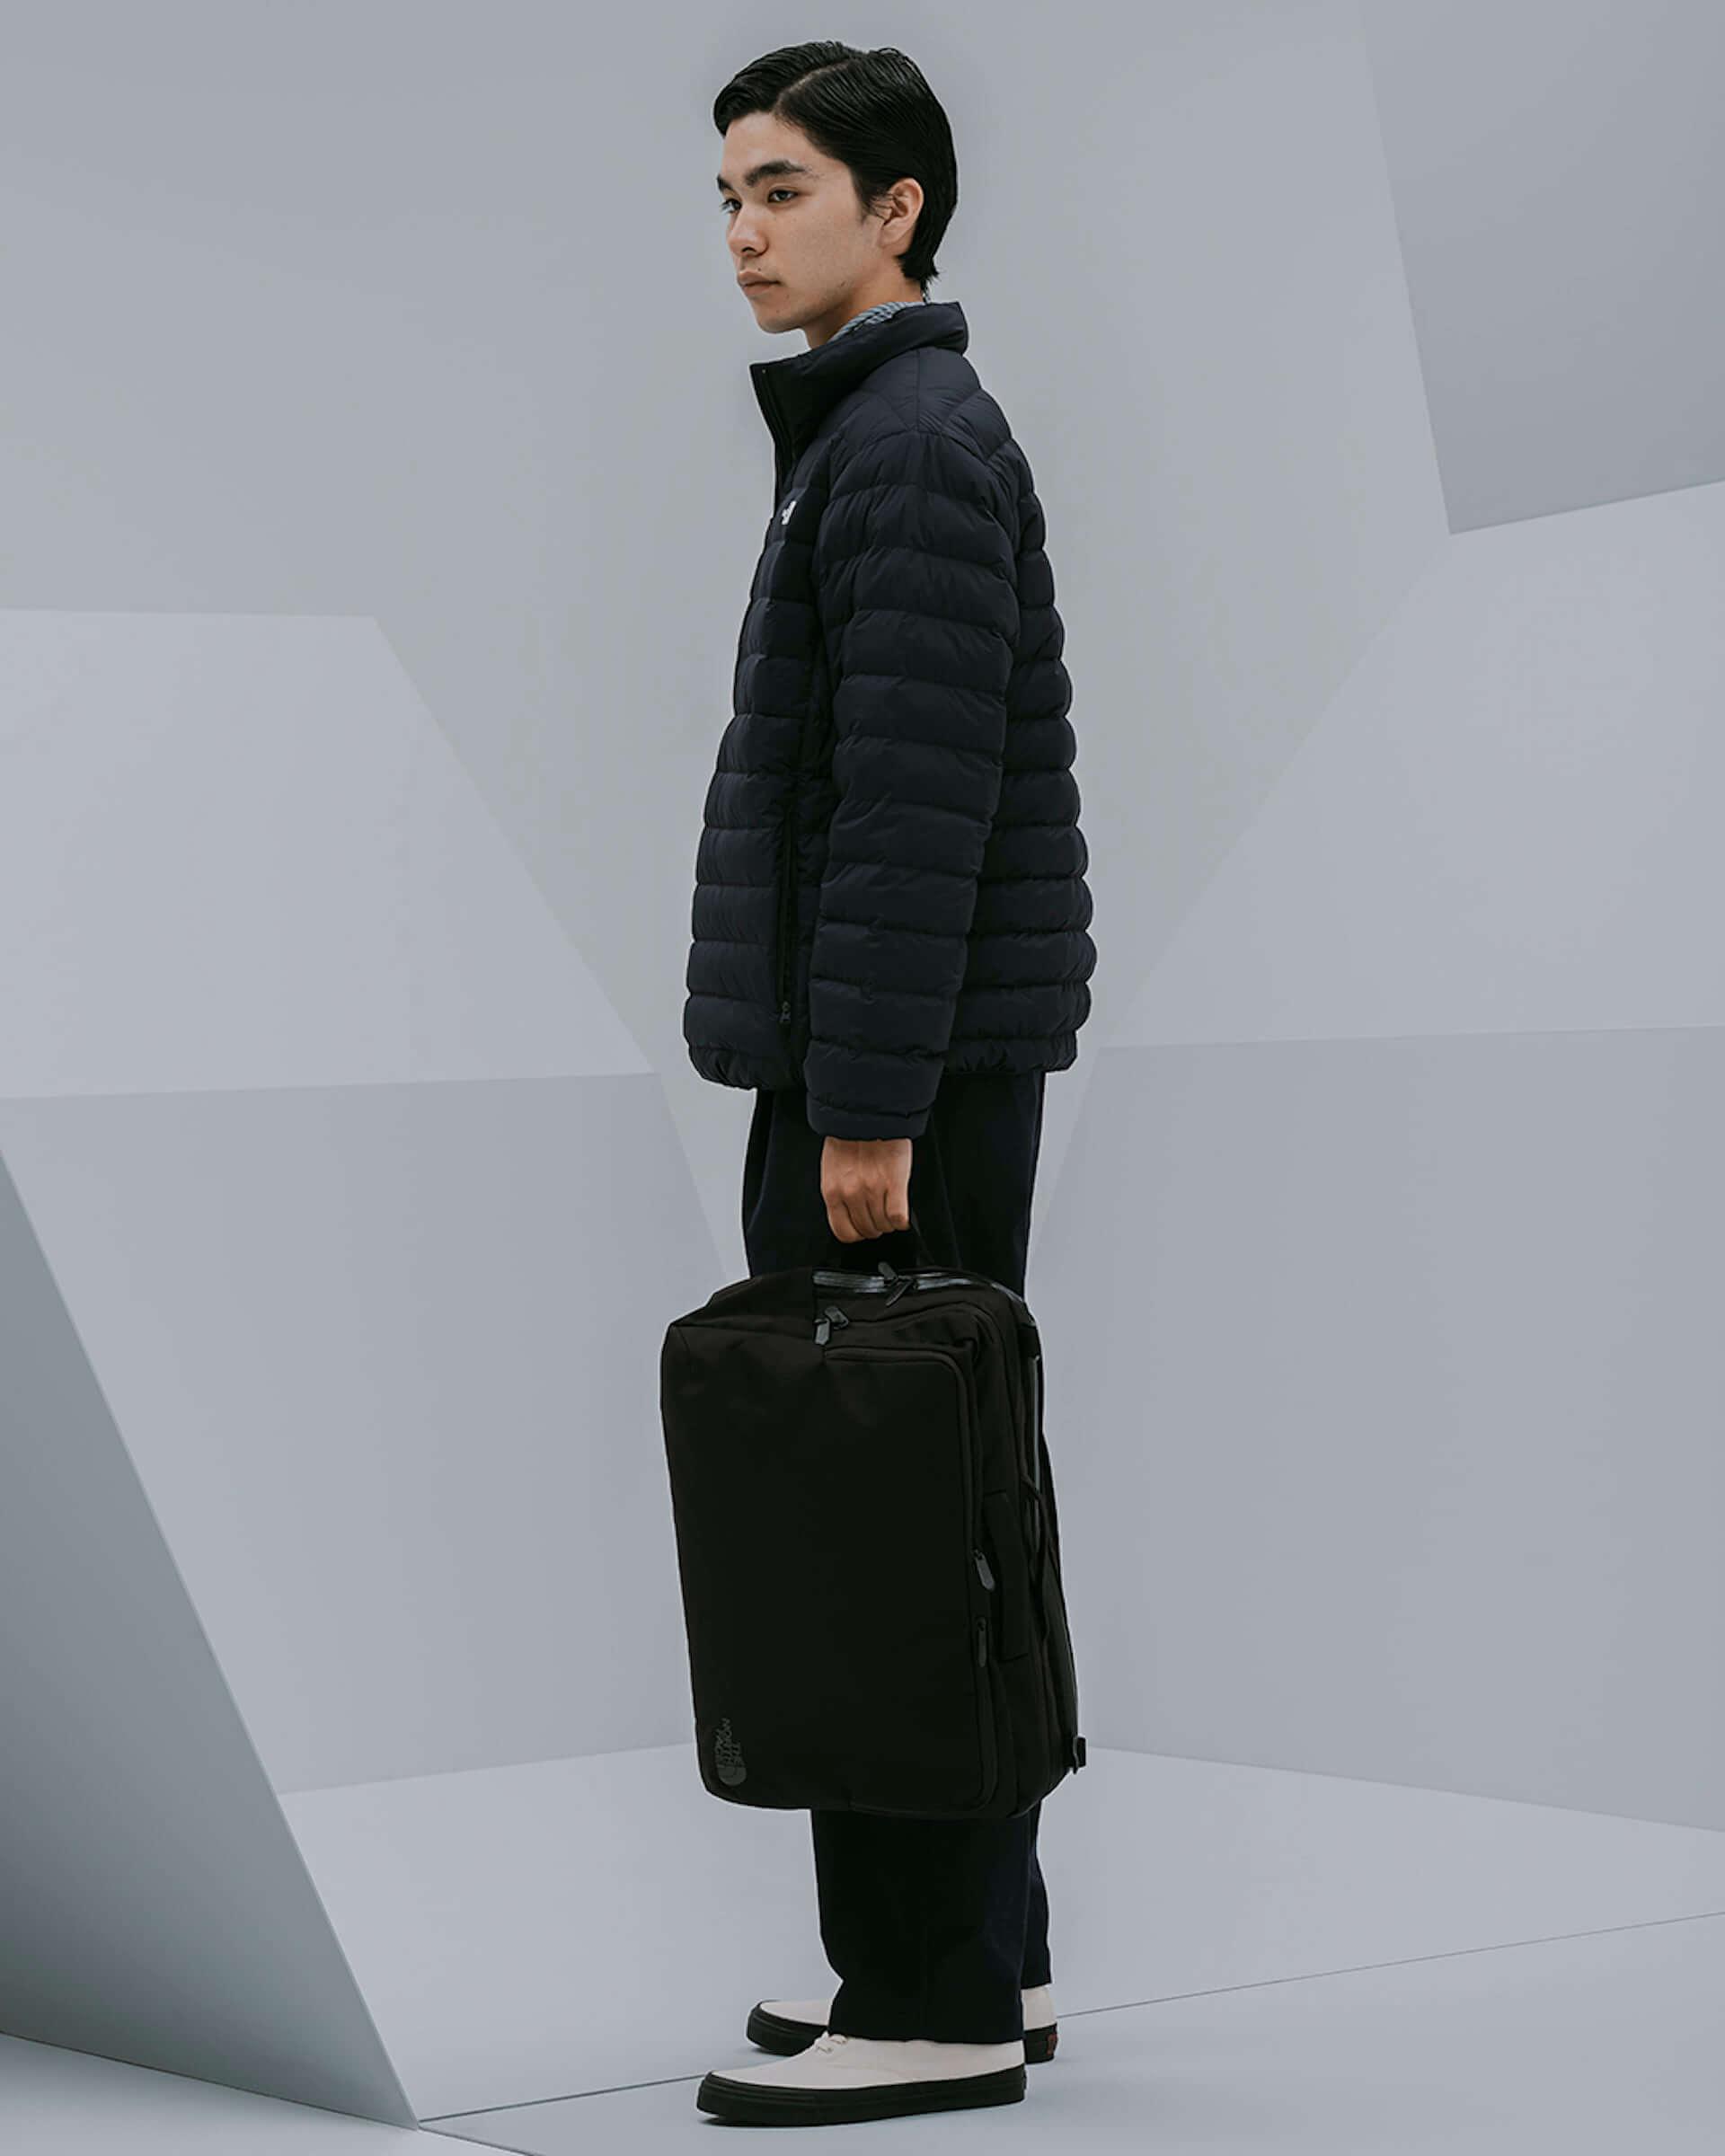 THE NORTH FACE日本橋店の2周年記念に別注コレクション「When the Dawning Brakes」が登場!「GORE-TEX SHAKEDRY」搭載のジャケットも lf201021_tnf-nihonbashi_12-1920x2400